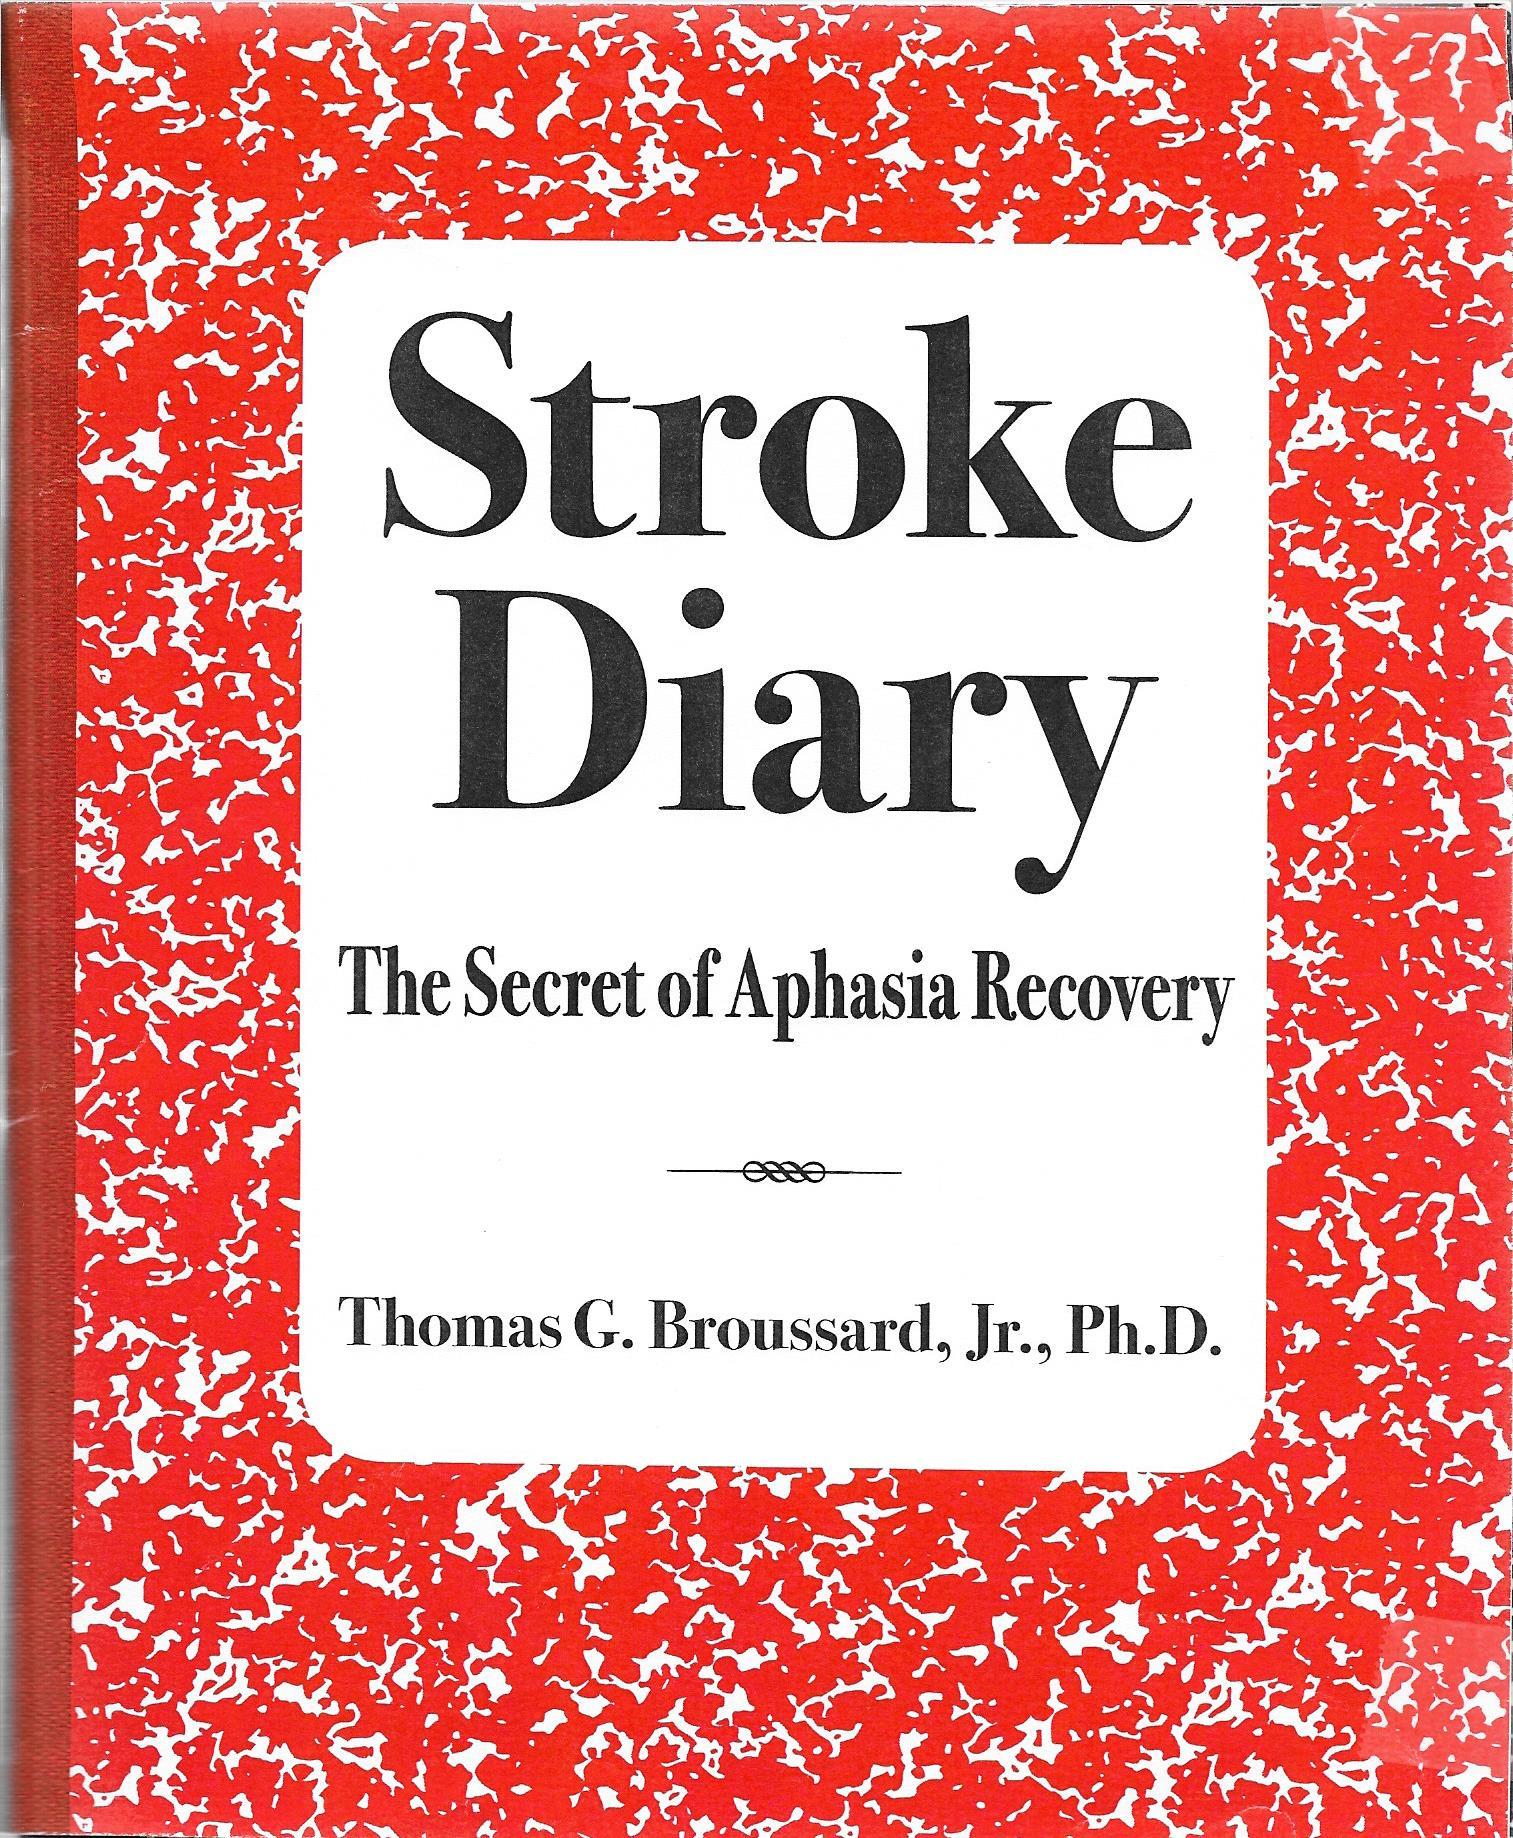 Stroke Diary Vol 2 Cover